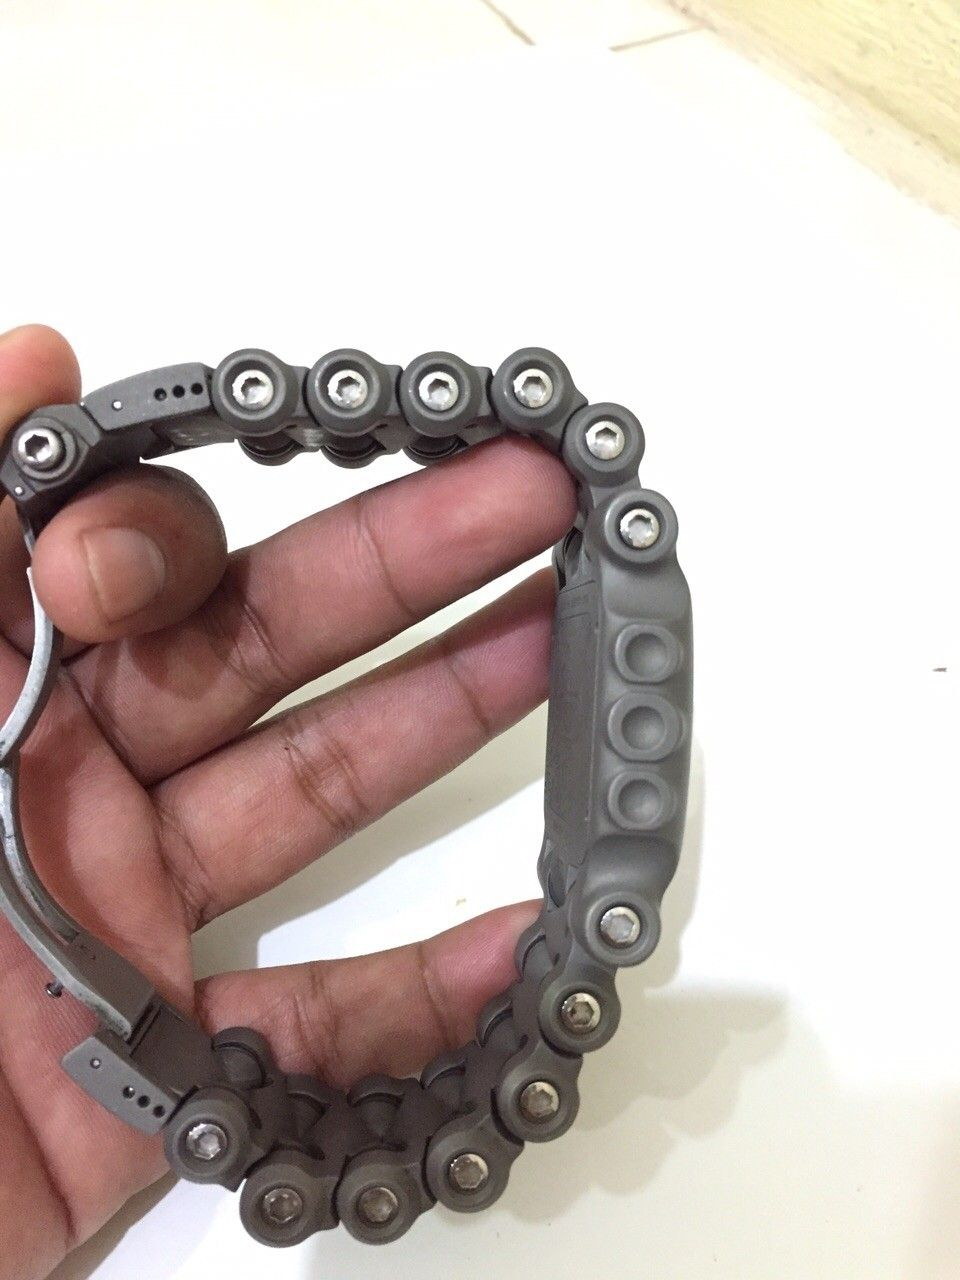 Minute machine silver dial xmetal custom - IMG-20150701-WA0011.jpg